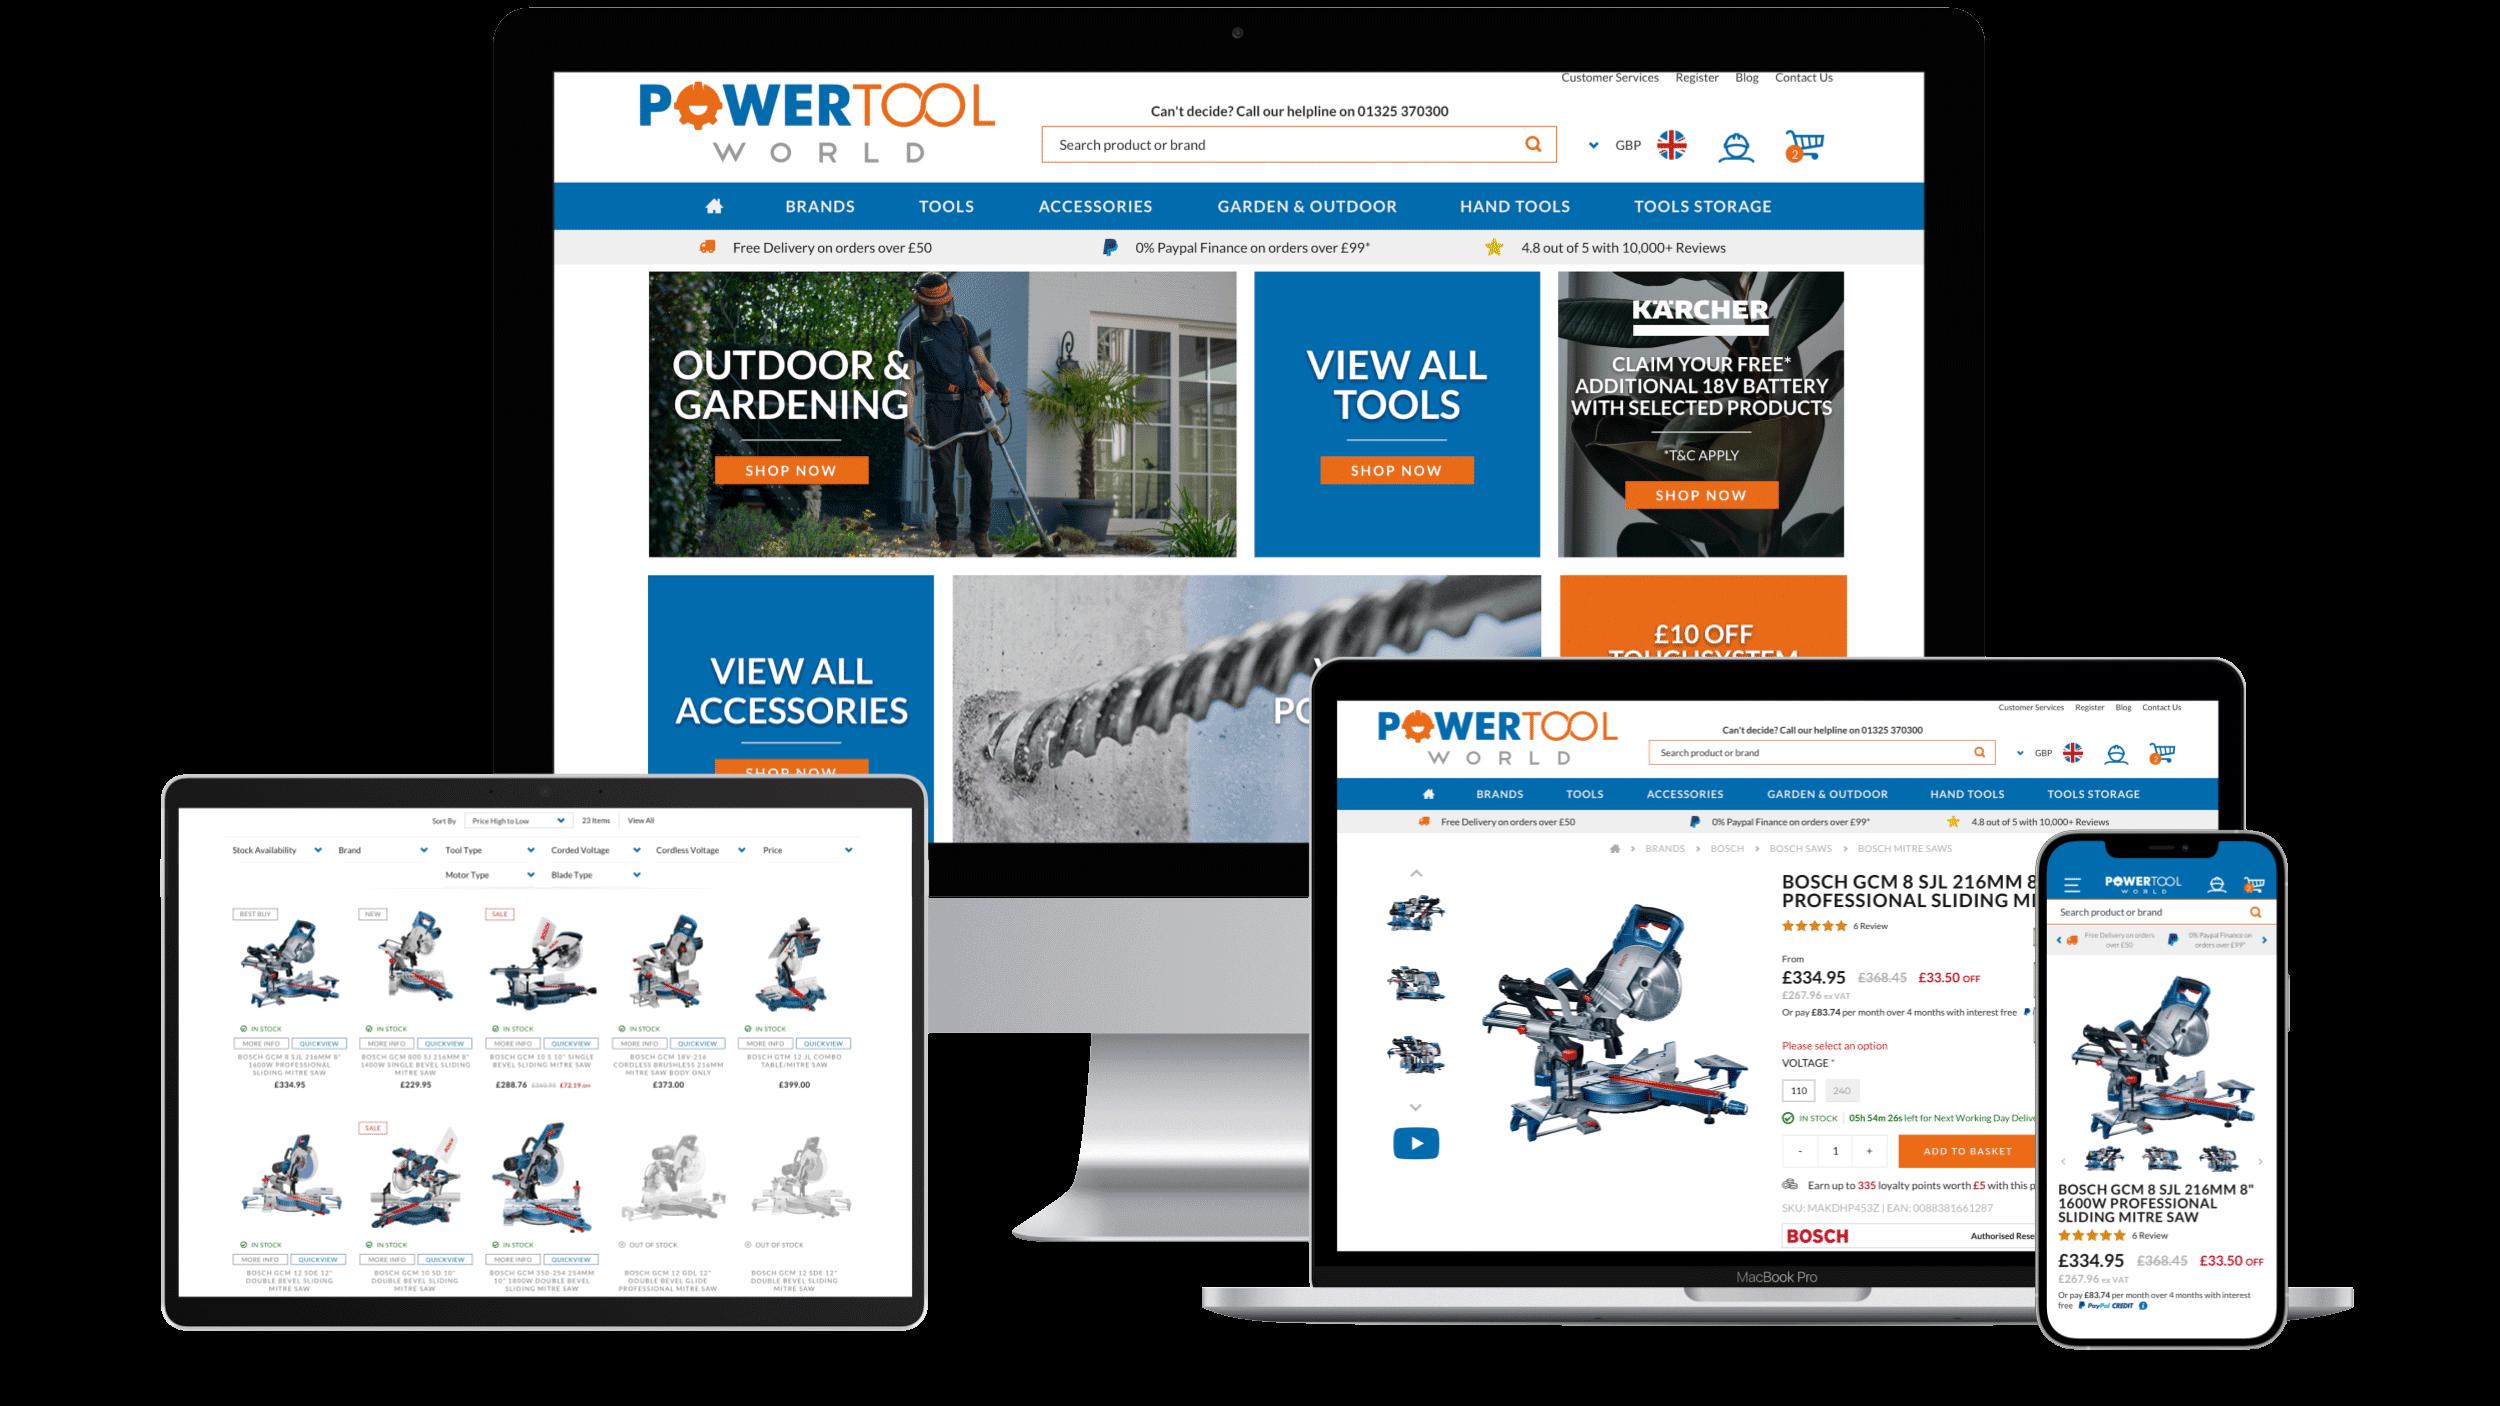 Powertool World Magento 2 Responsive Design